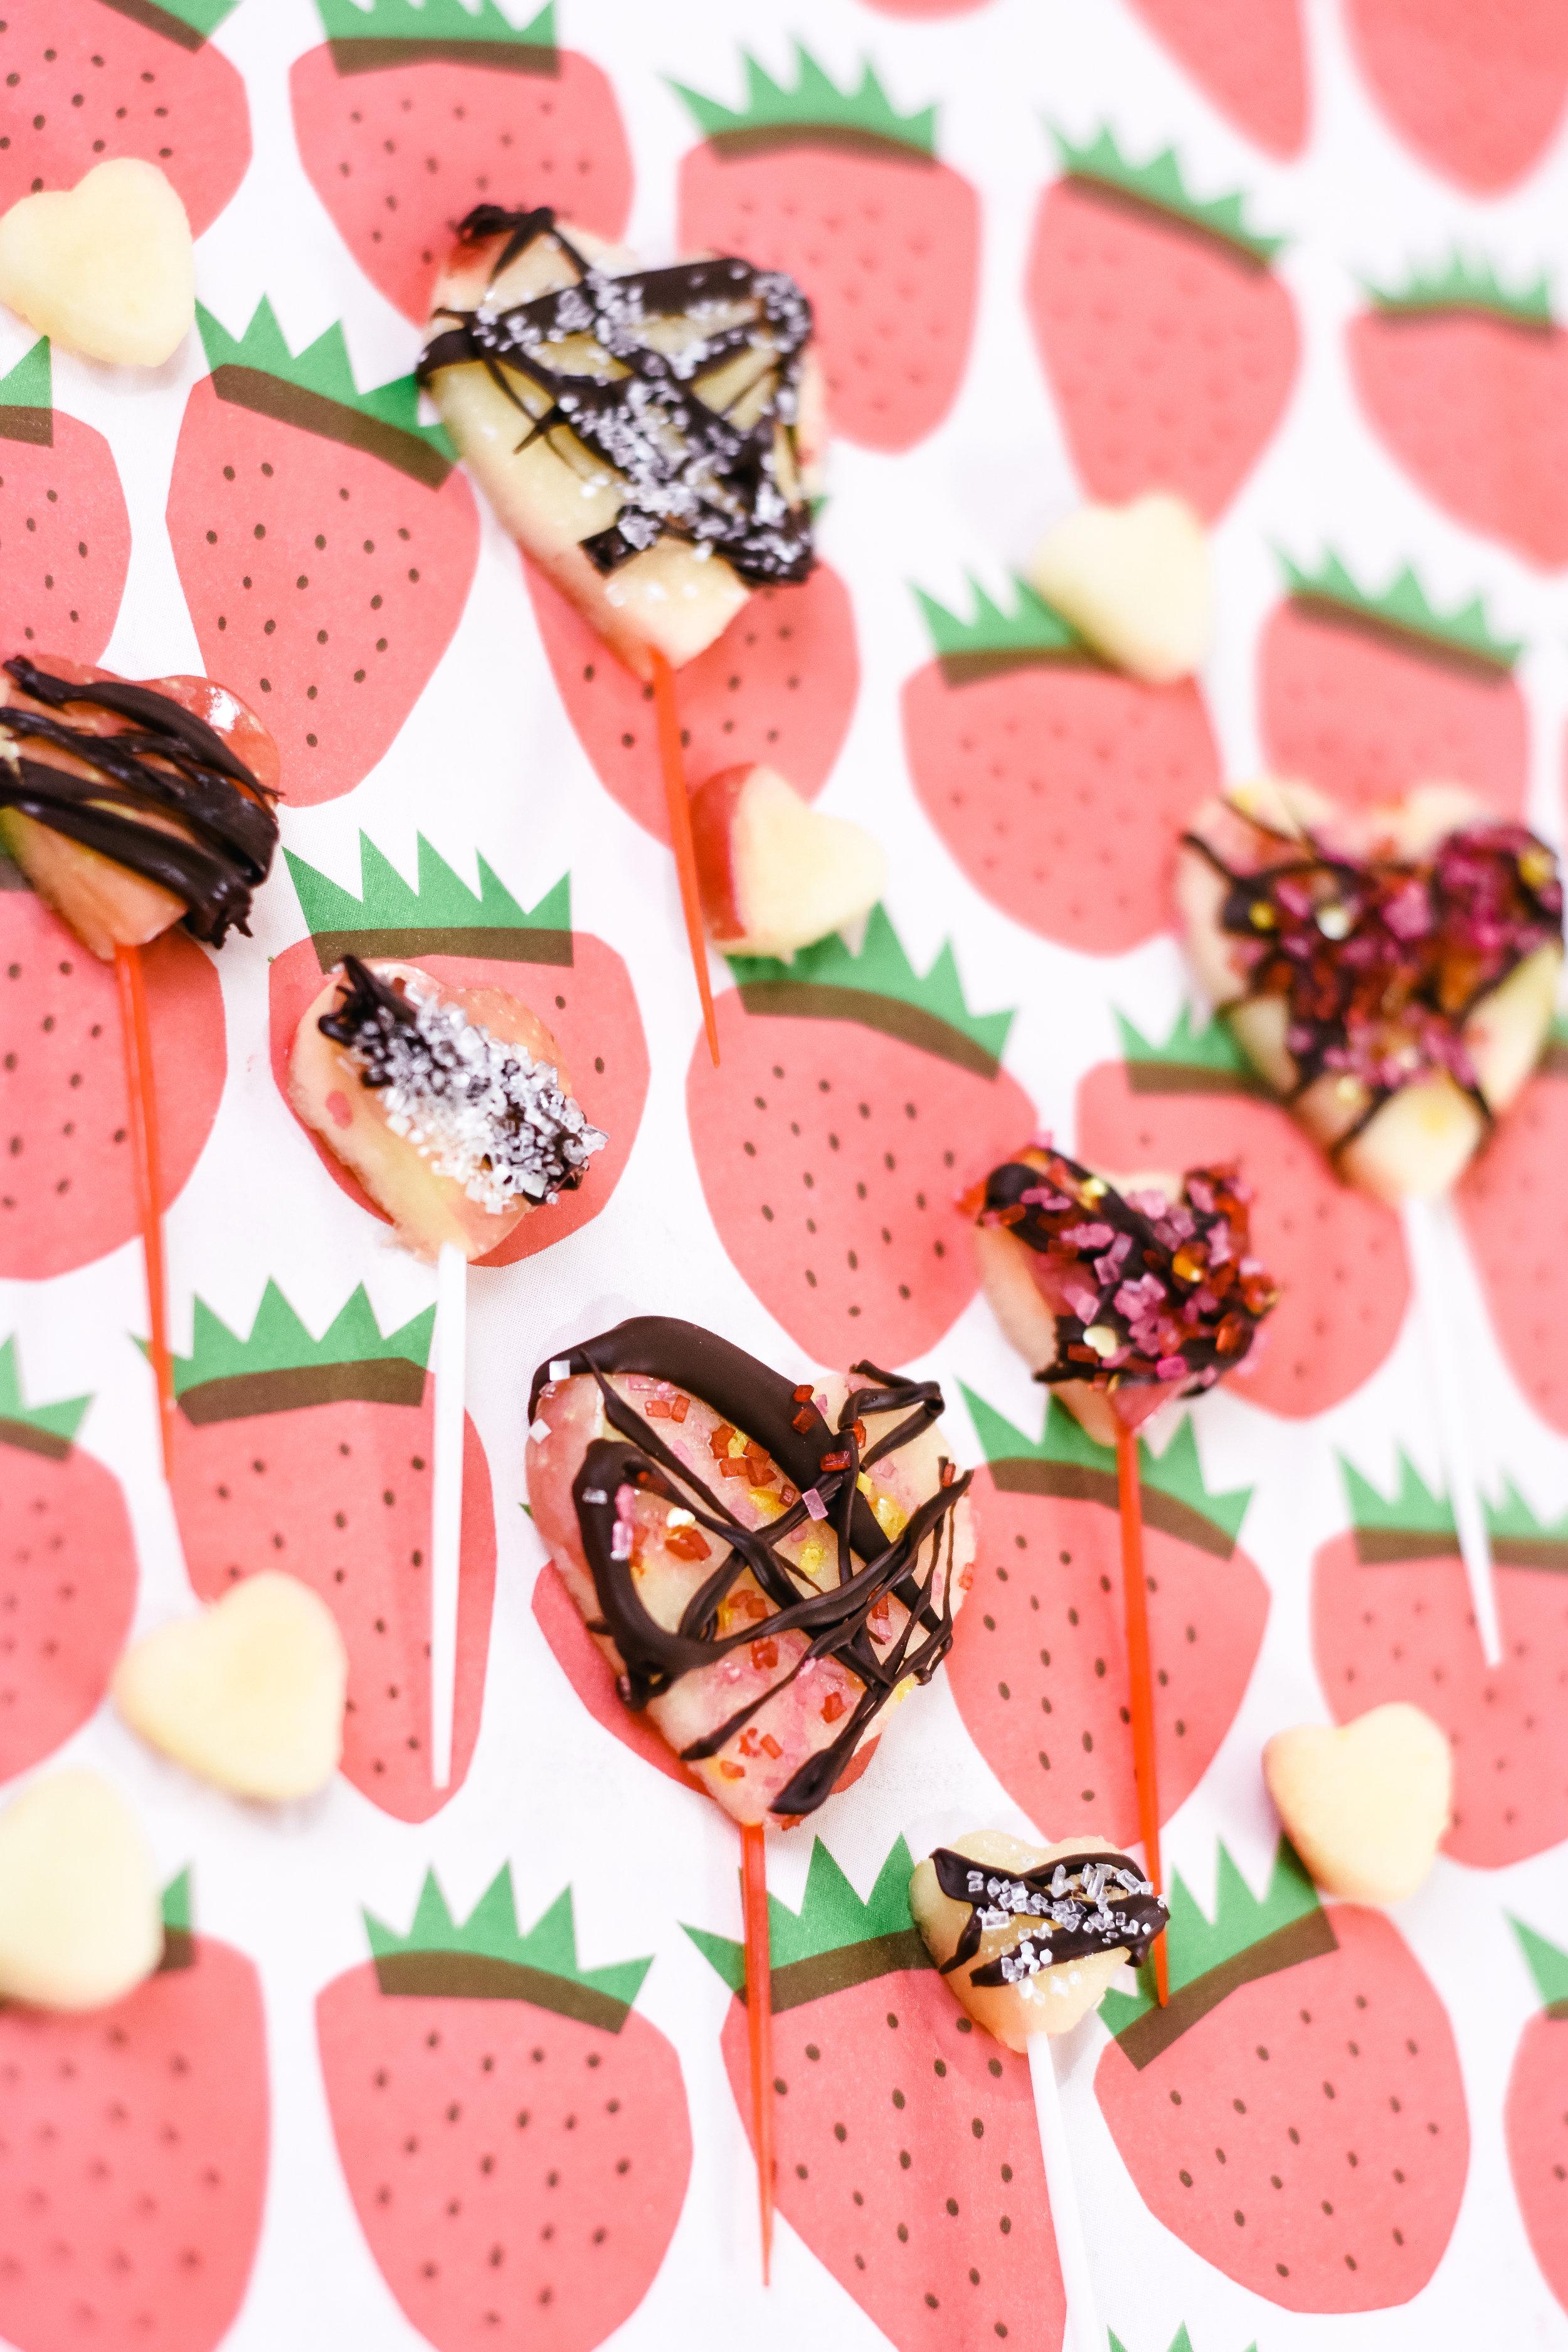 Enjoy life Valentine's Chocolate Apples LL & Co. -14.jpg